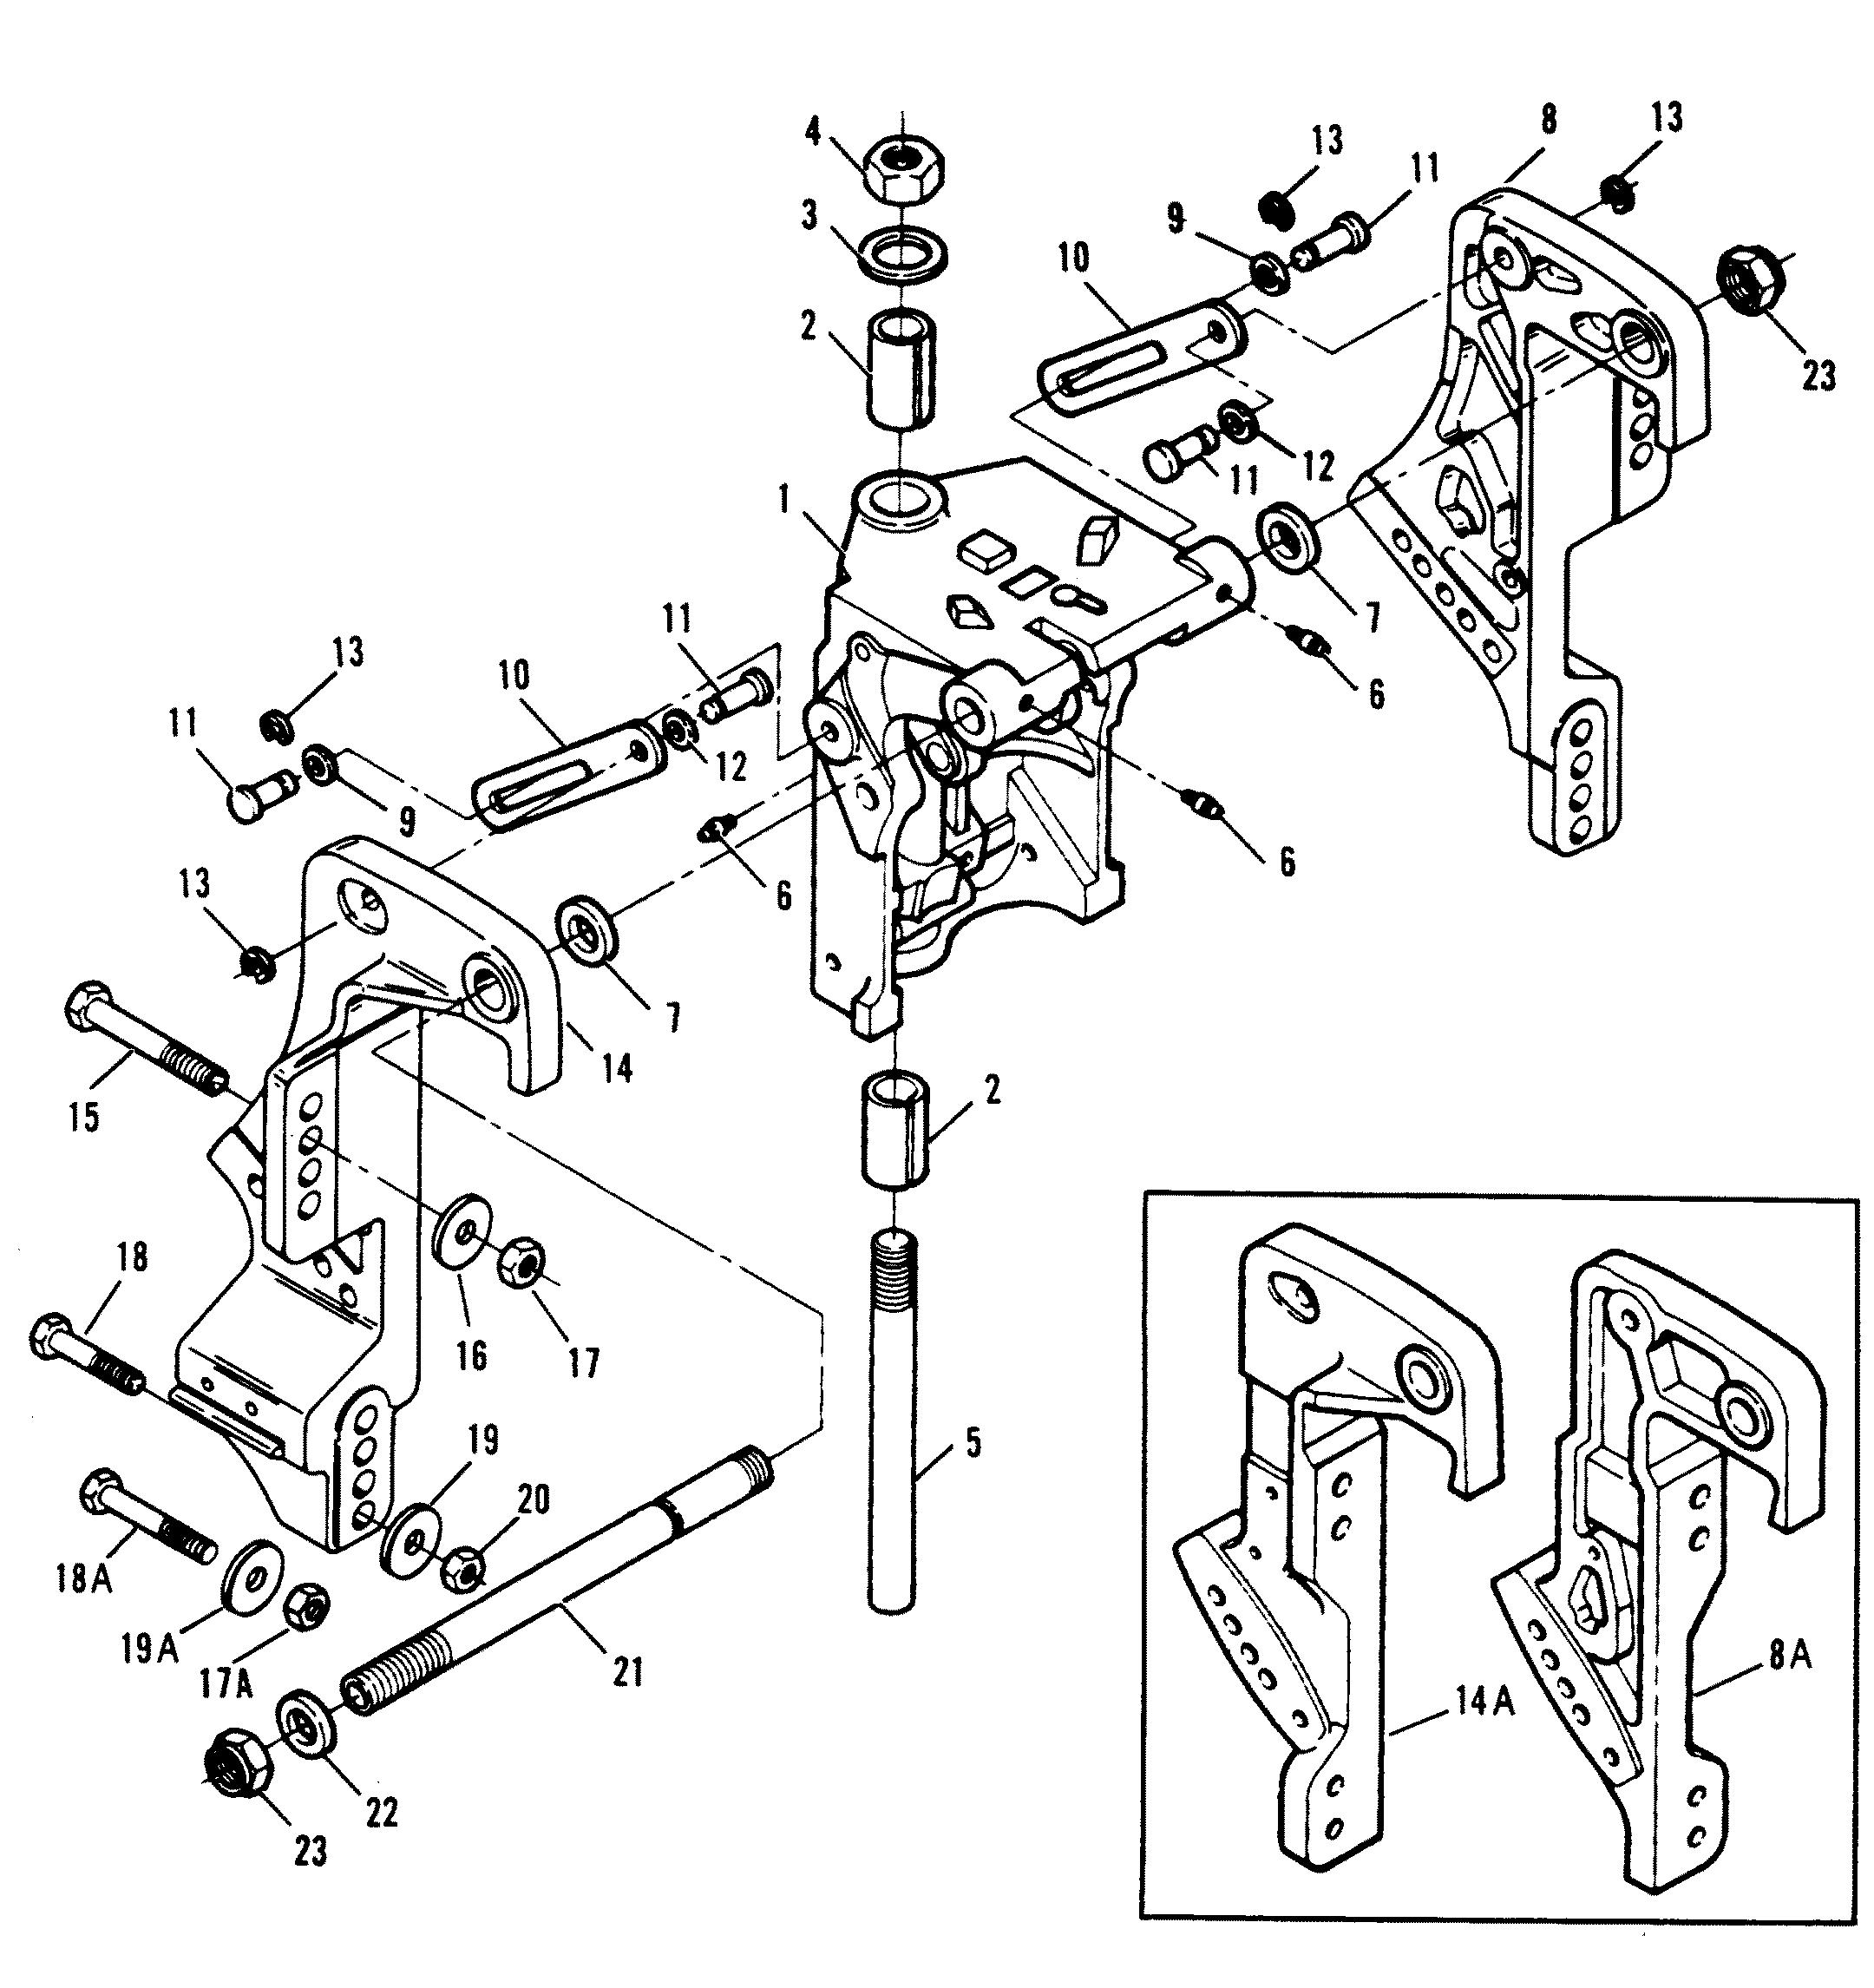 Mercury | FORCE | 40 H.P. (1992-1994) | 1992-C | SWIVEL BRACKET/STERN  BRACKETS POWER TRIM MODELS